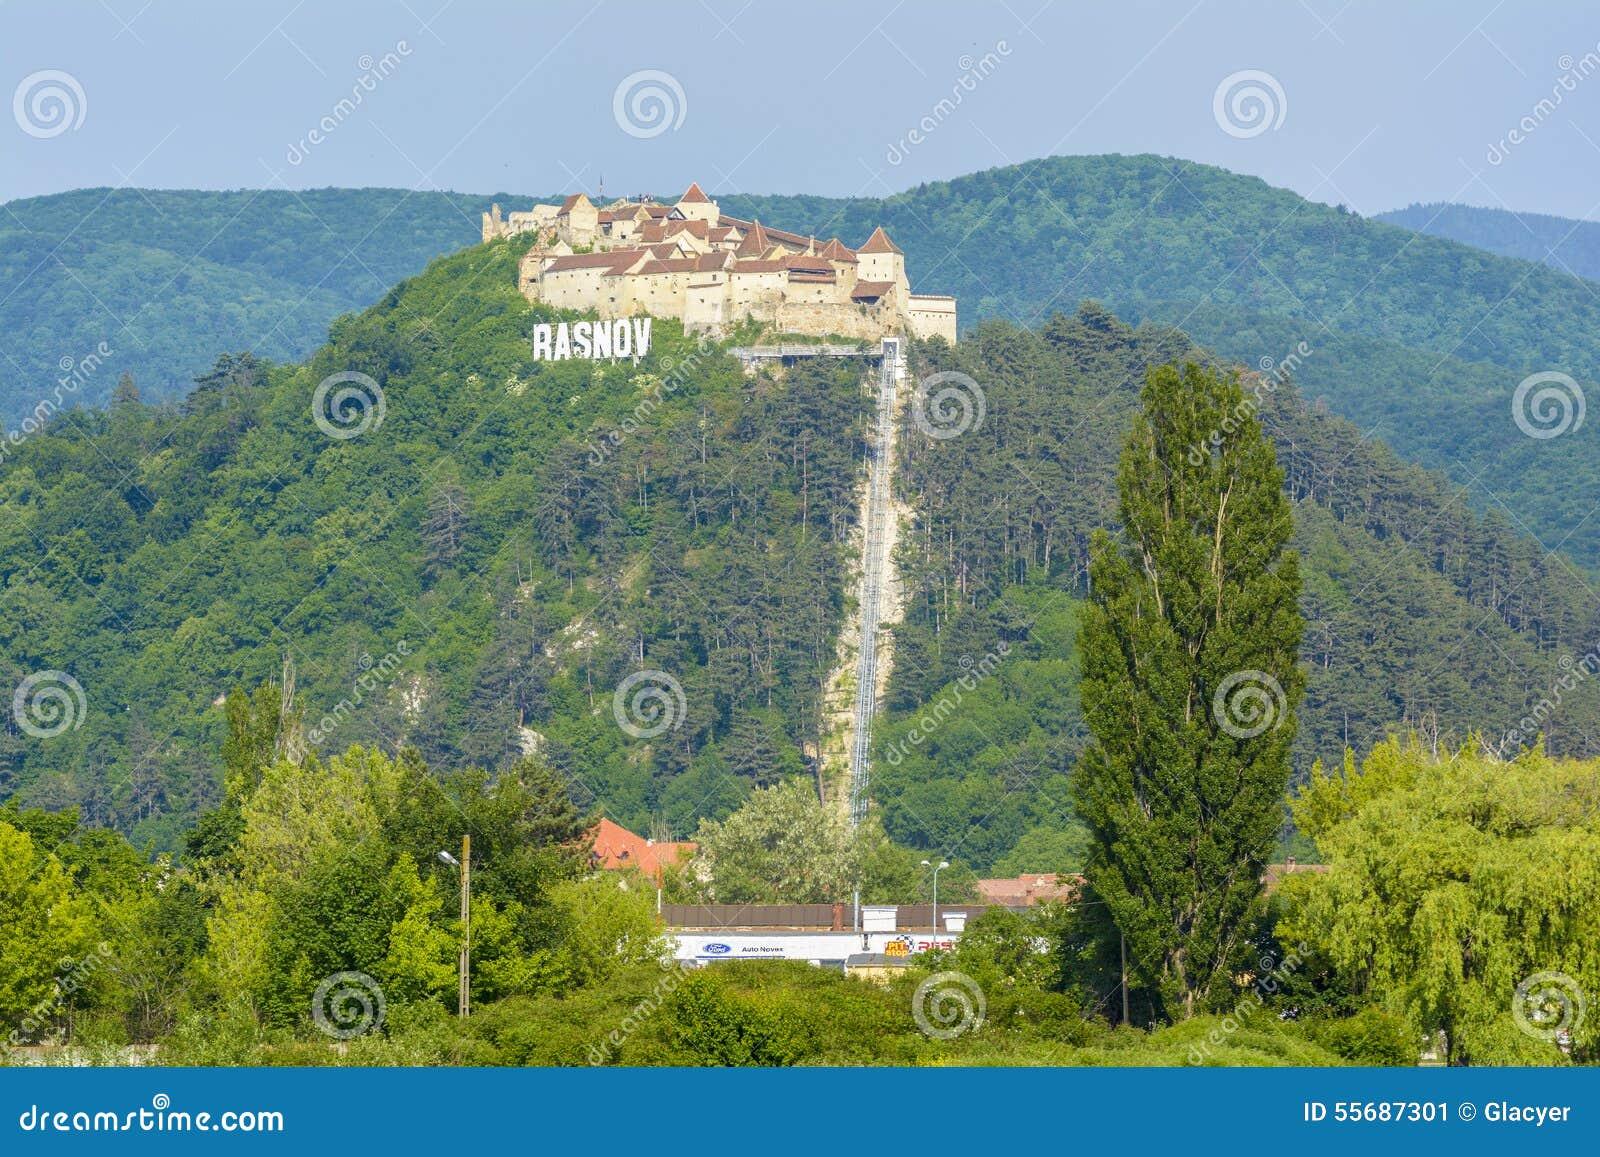 Rasnov fortress, Transylvania Romania